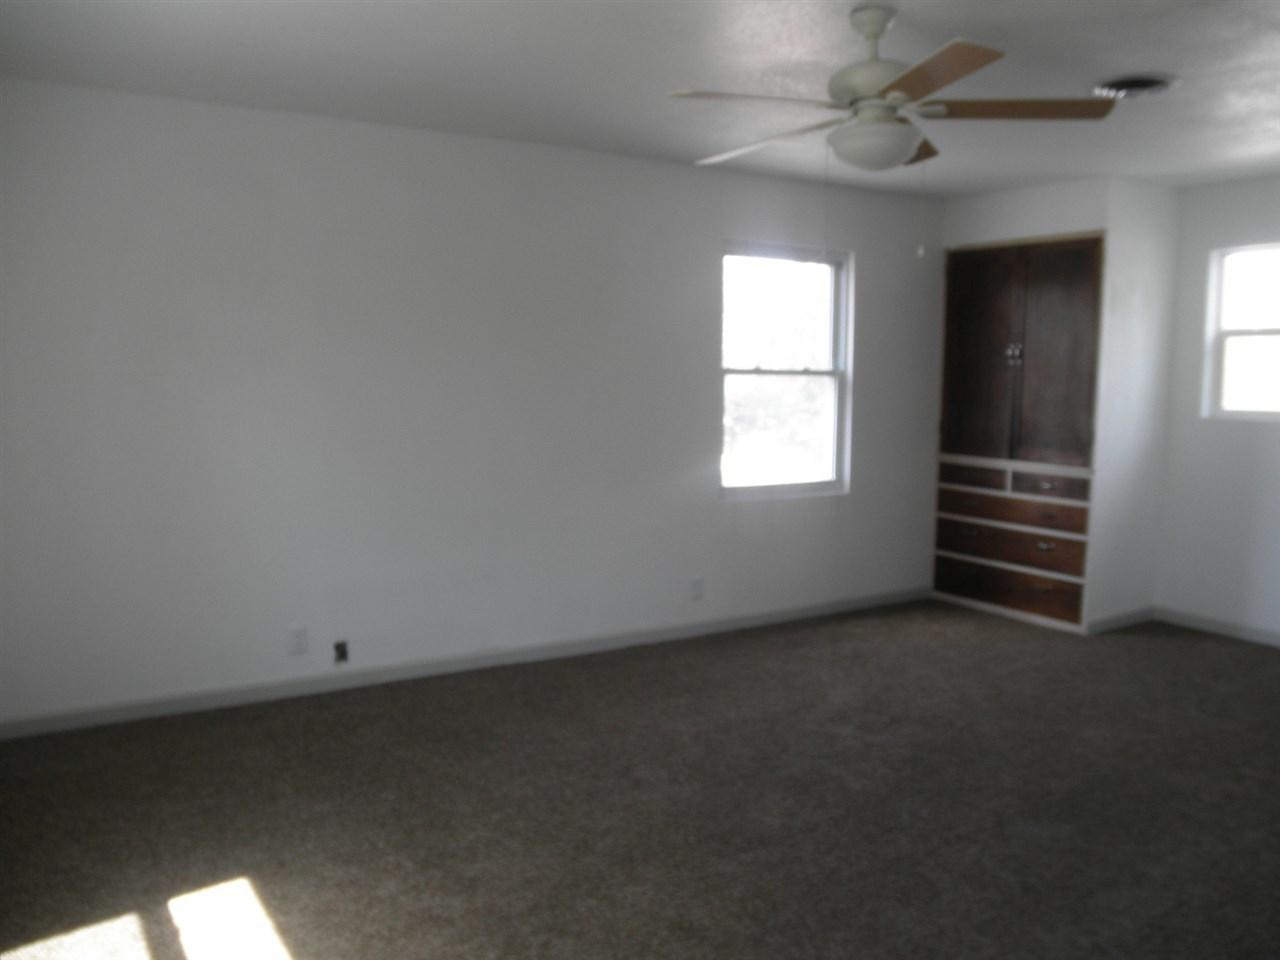 Sold Cross Sale W/ MLS | 189 Tapp Road  Ponca City, OK 74604 19